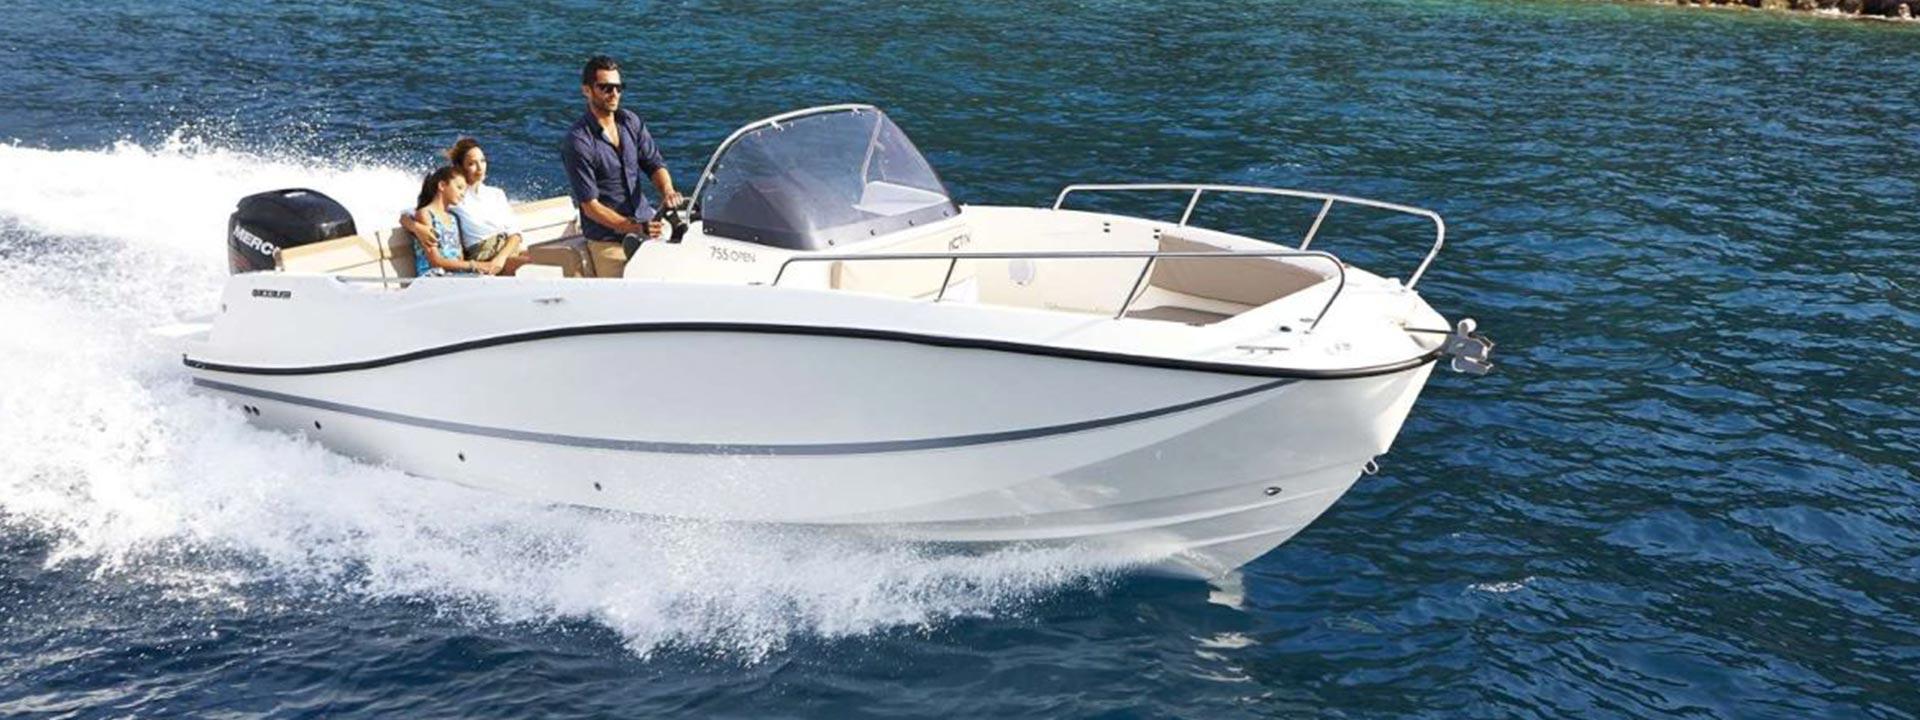 mayer-charter-boat-header-quicksilver-activ-755-open-01